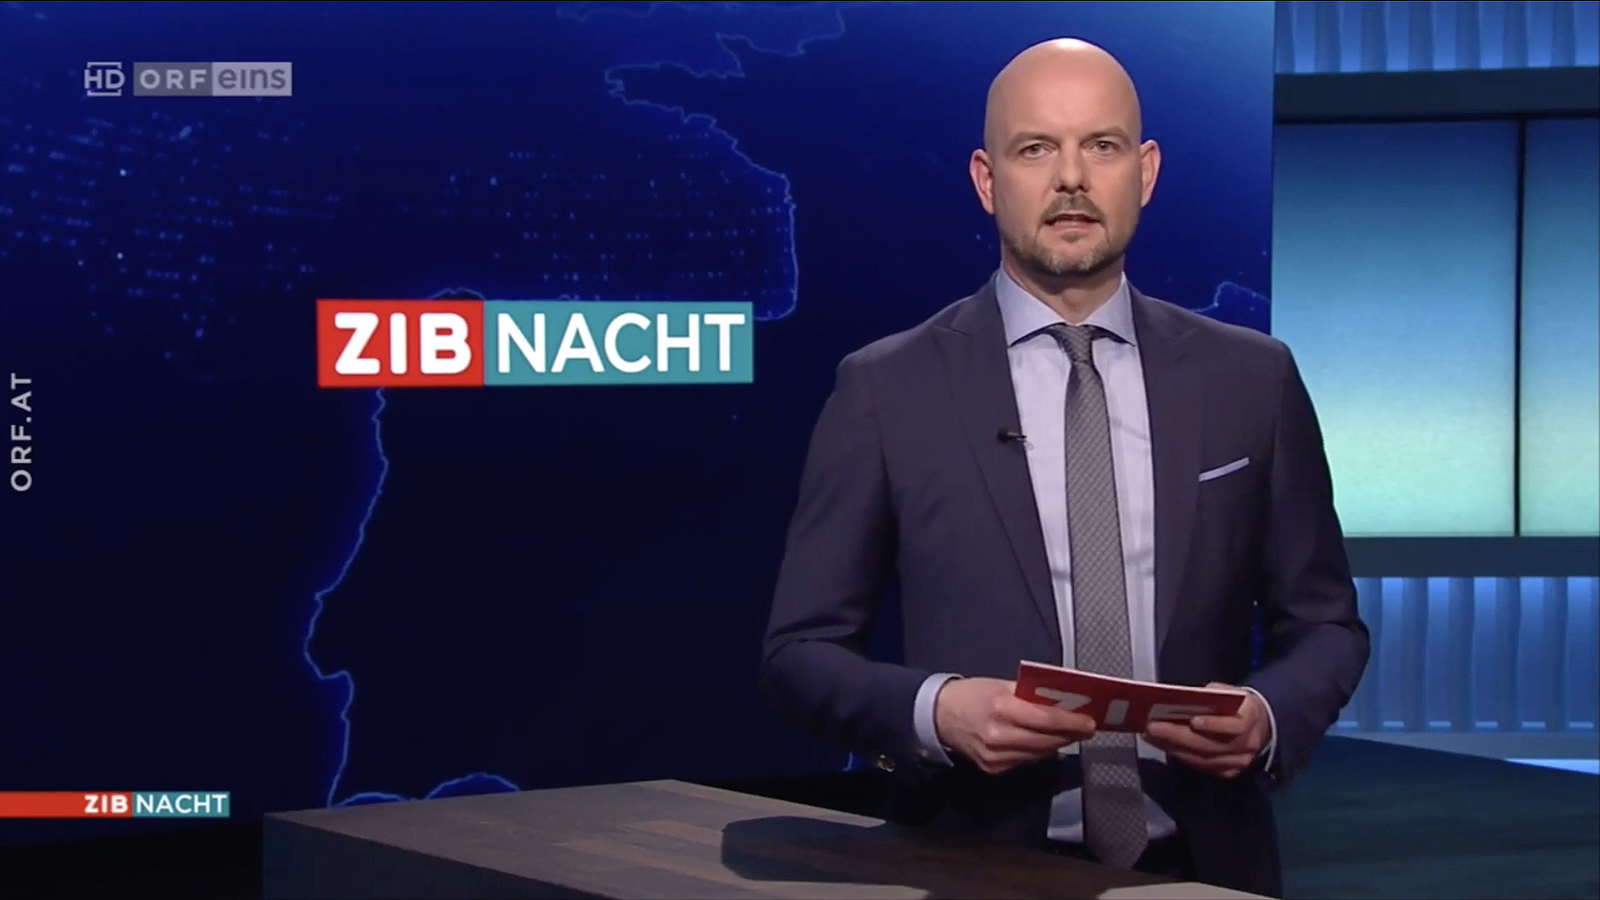 NCS_ORF-Veech-2019_0005